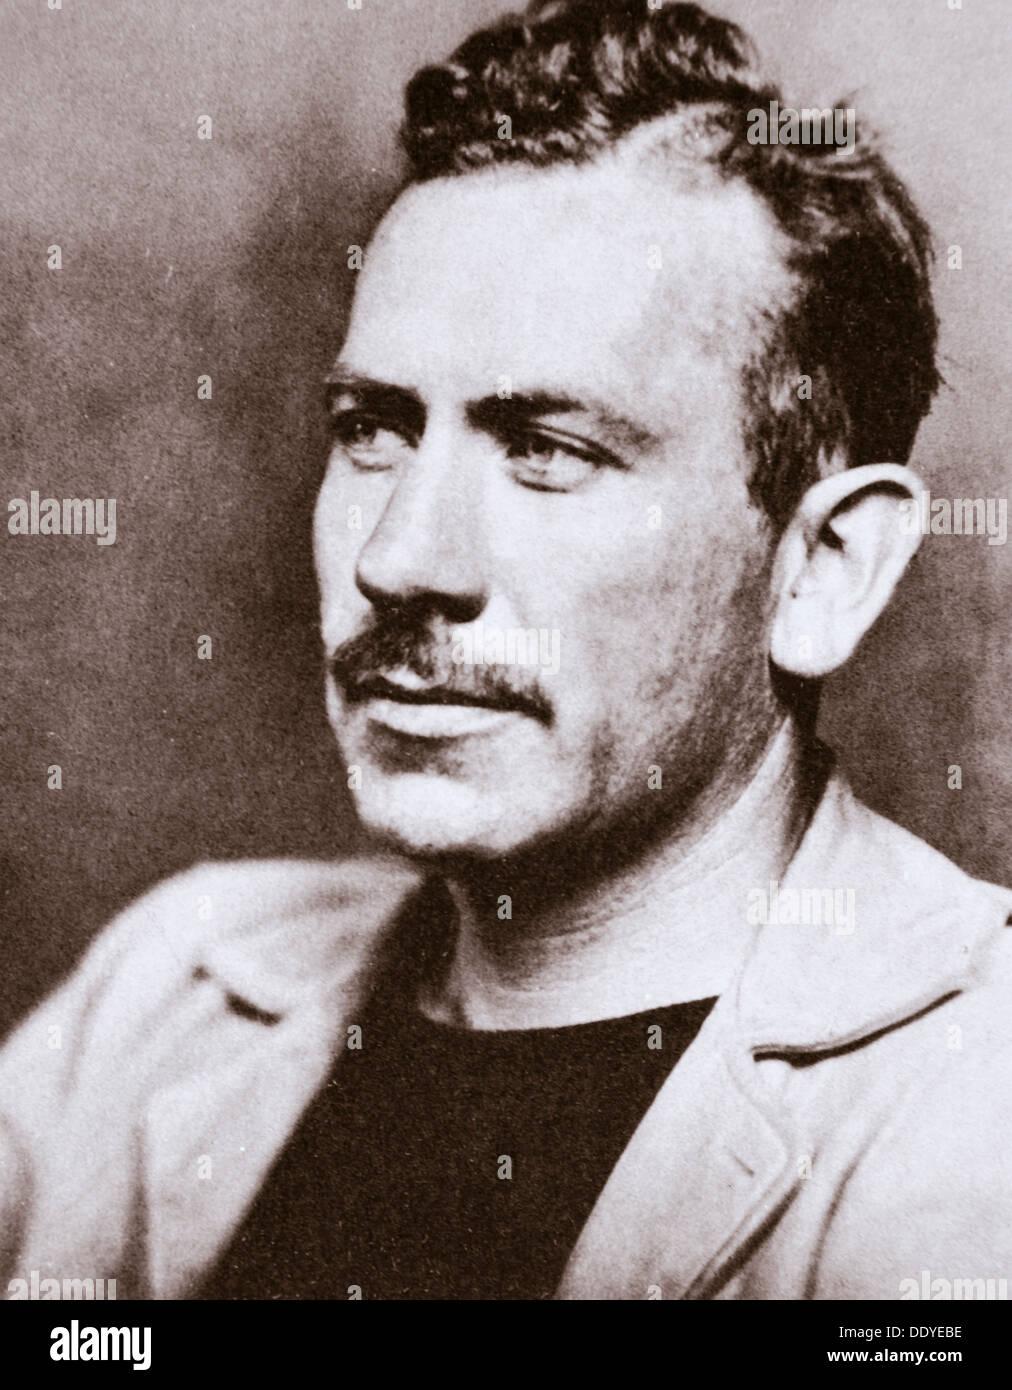 John Steinbeck, American novelist, c1939. Artist: Unknown - Stock Image